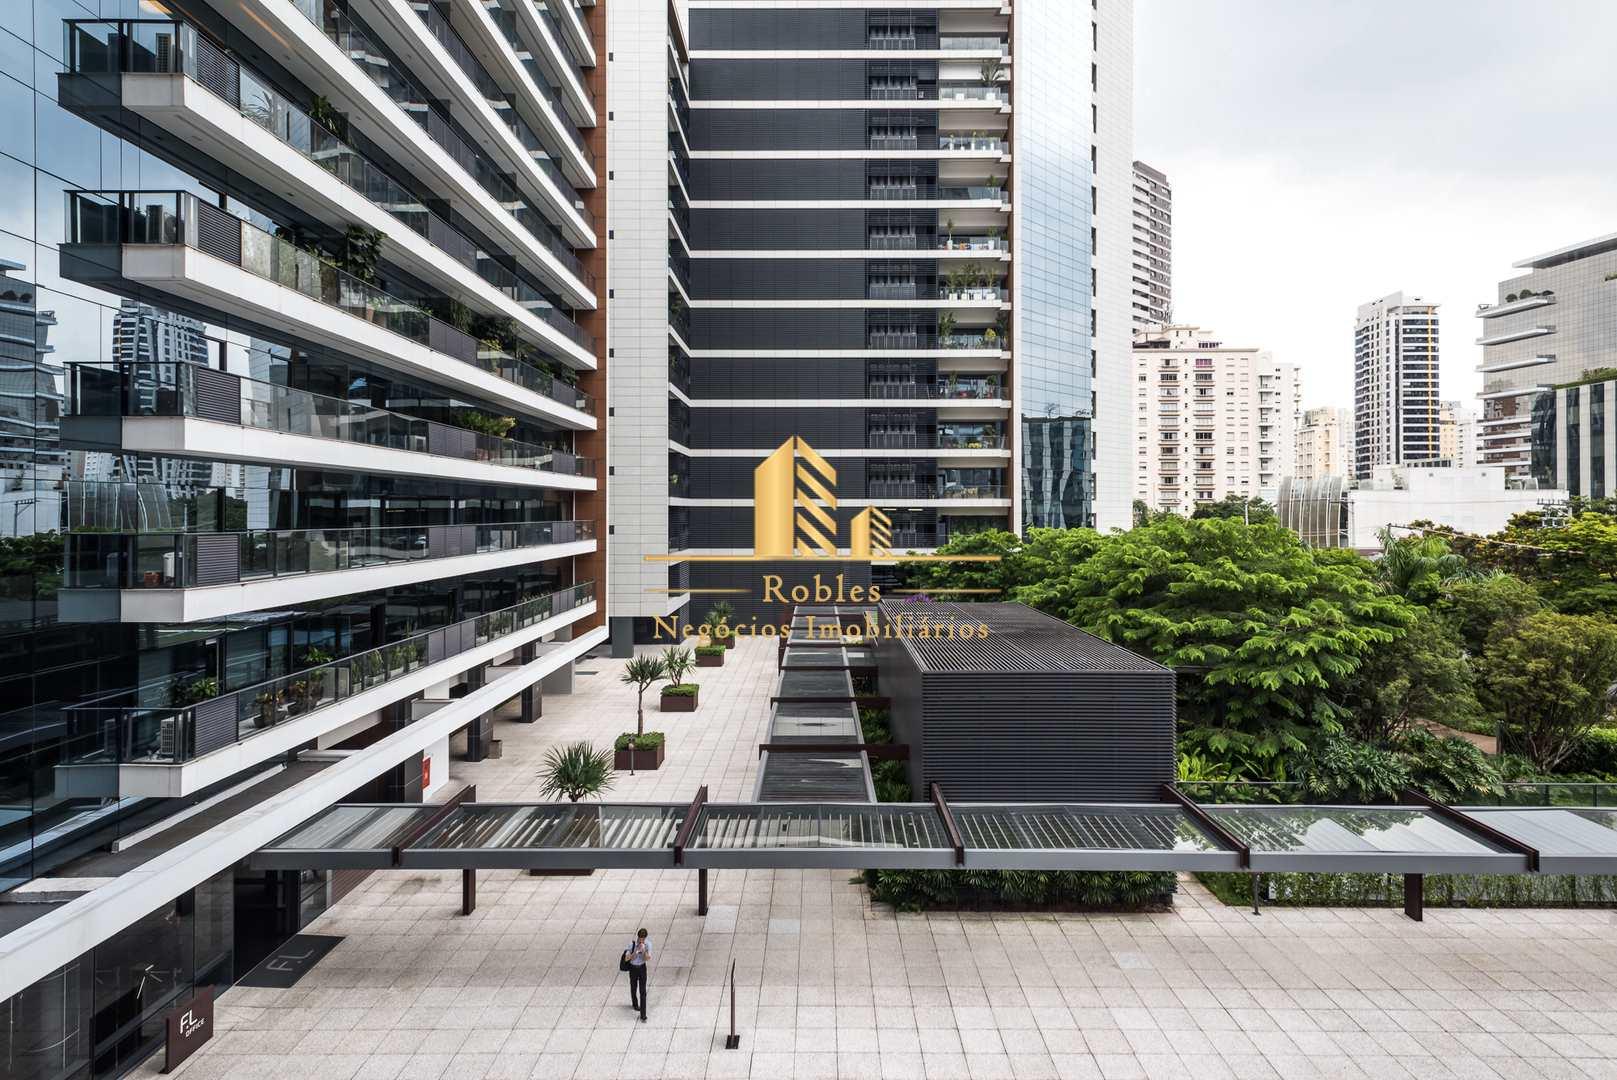 Apartamento com 1 dorm, Vila Olímpia, São Paulo - R$ 1.5 mi, Cod: 451